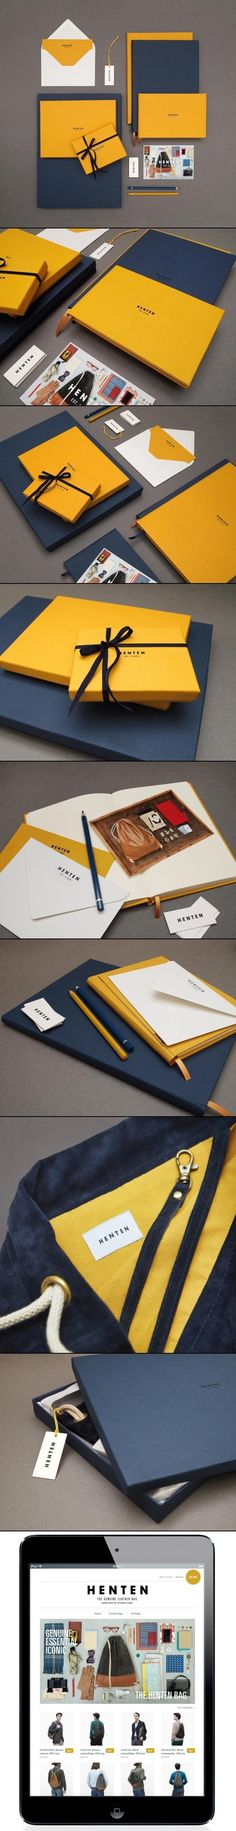 20 Diseños de Branding e Identidad Corporativa - Taringa!